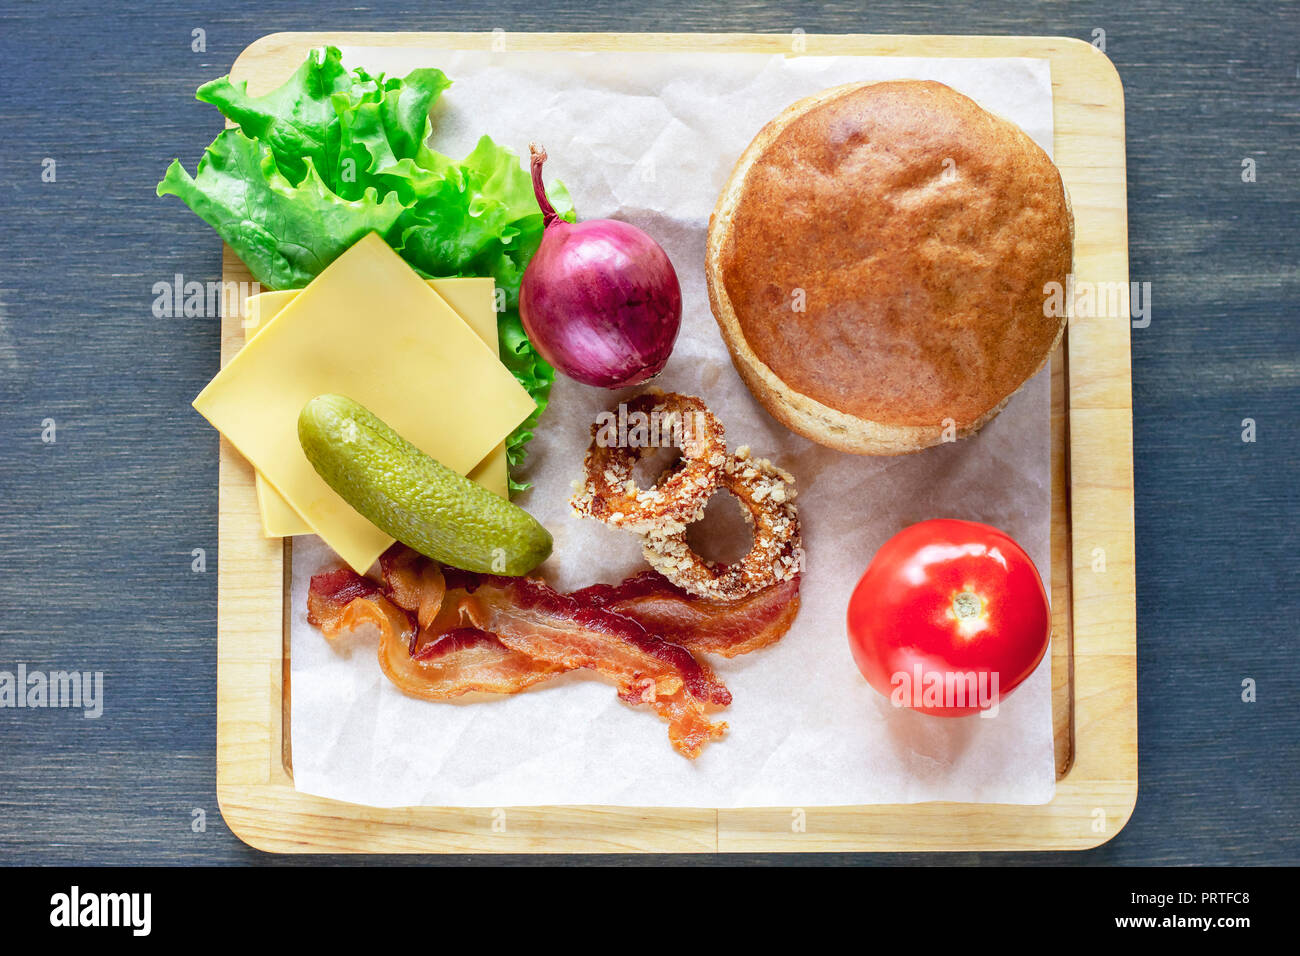 Ingredients for Burger bun, onion, lettuce, tomato, bacon and ot Stock Photo